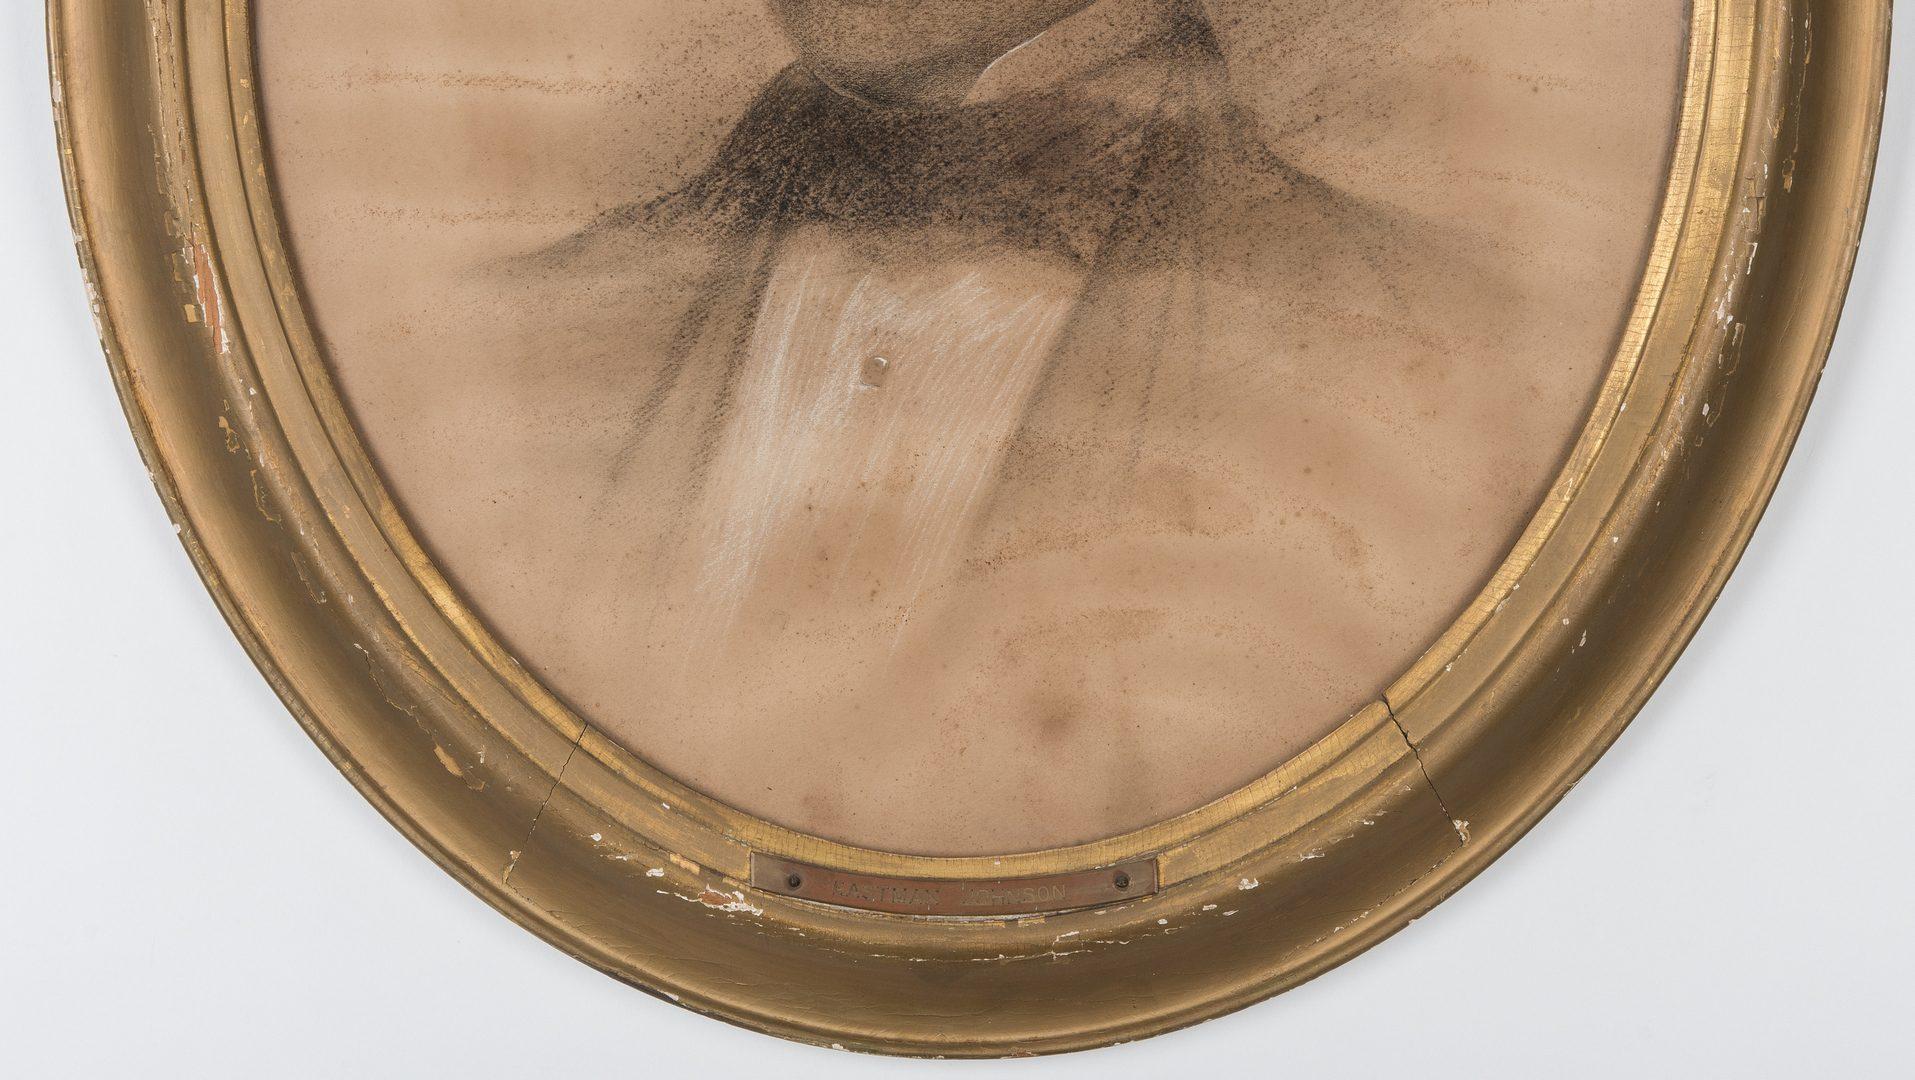 Lot 226: Attrib. Eastman Johnson, Portrait of a Gentleman